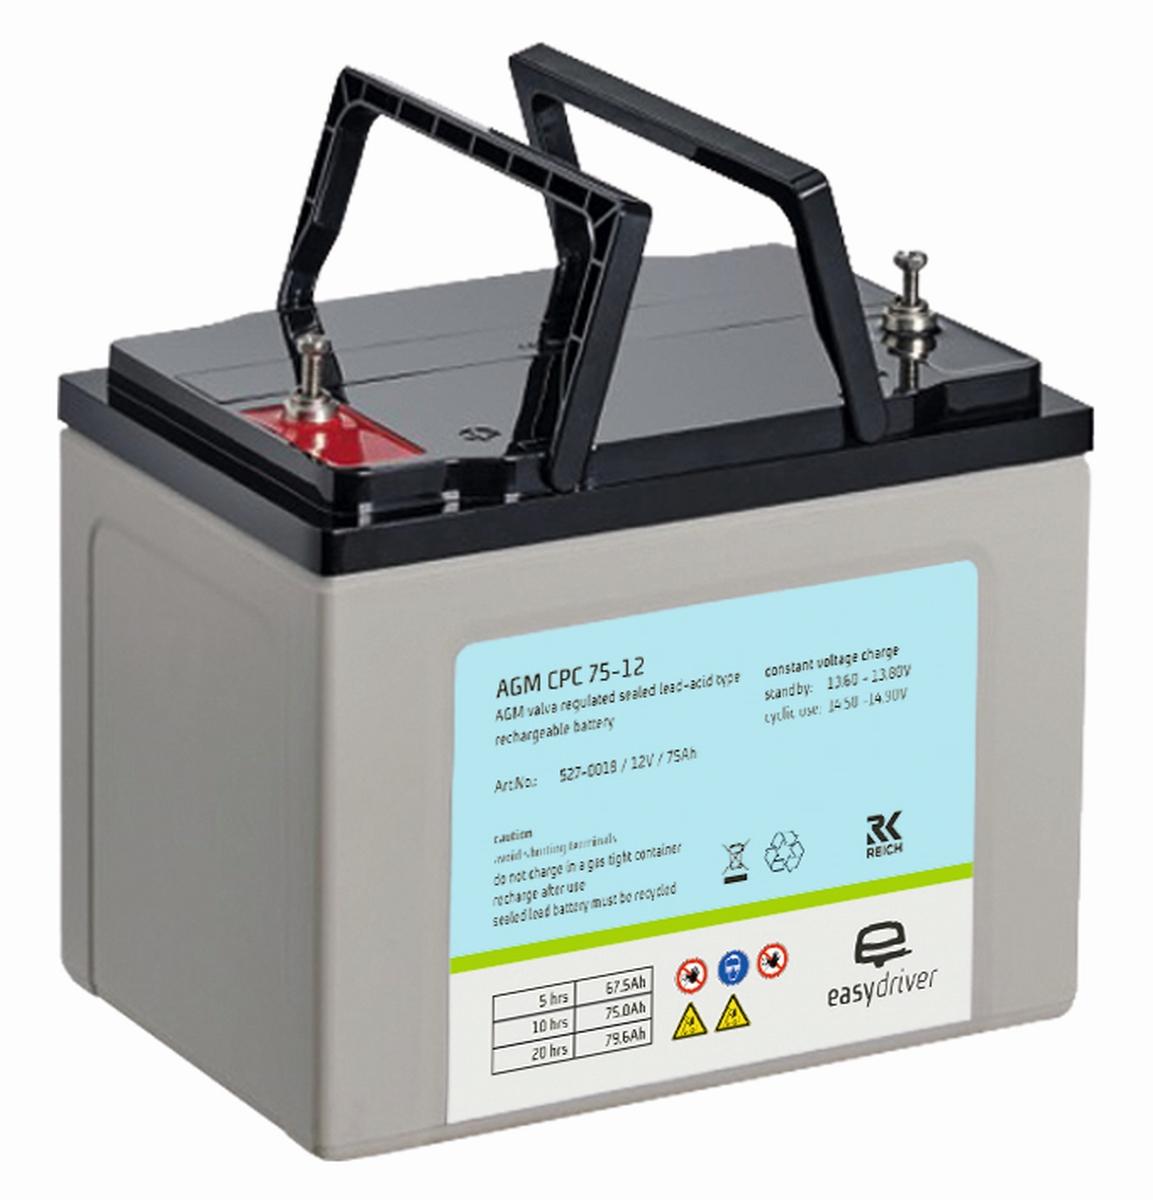 RK REICH easydriver Energie-Paket L